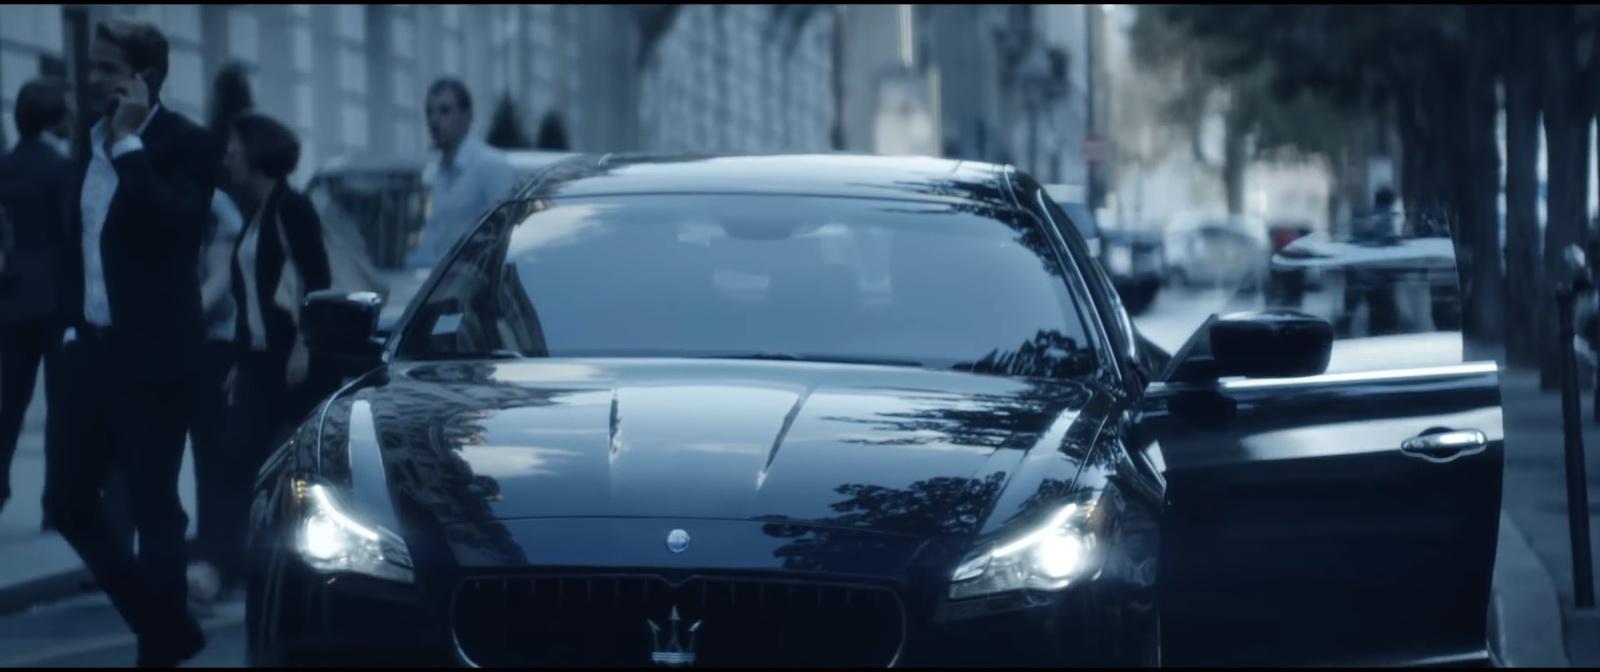 Maserati Quattroporte - Mylène Farmer & Sting - Stolen Car (1)